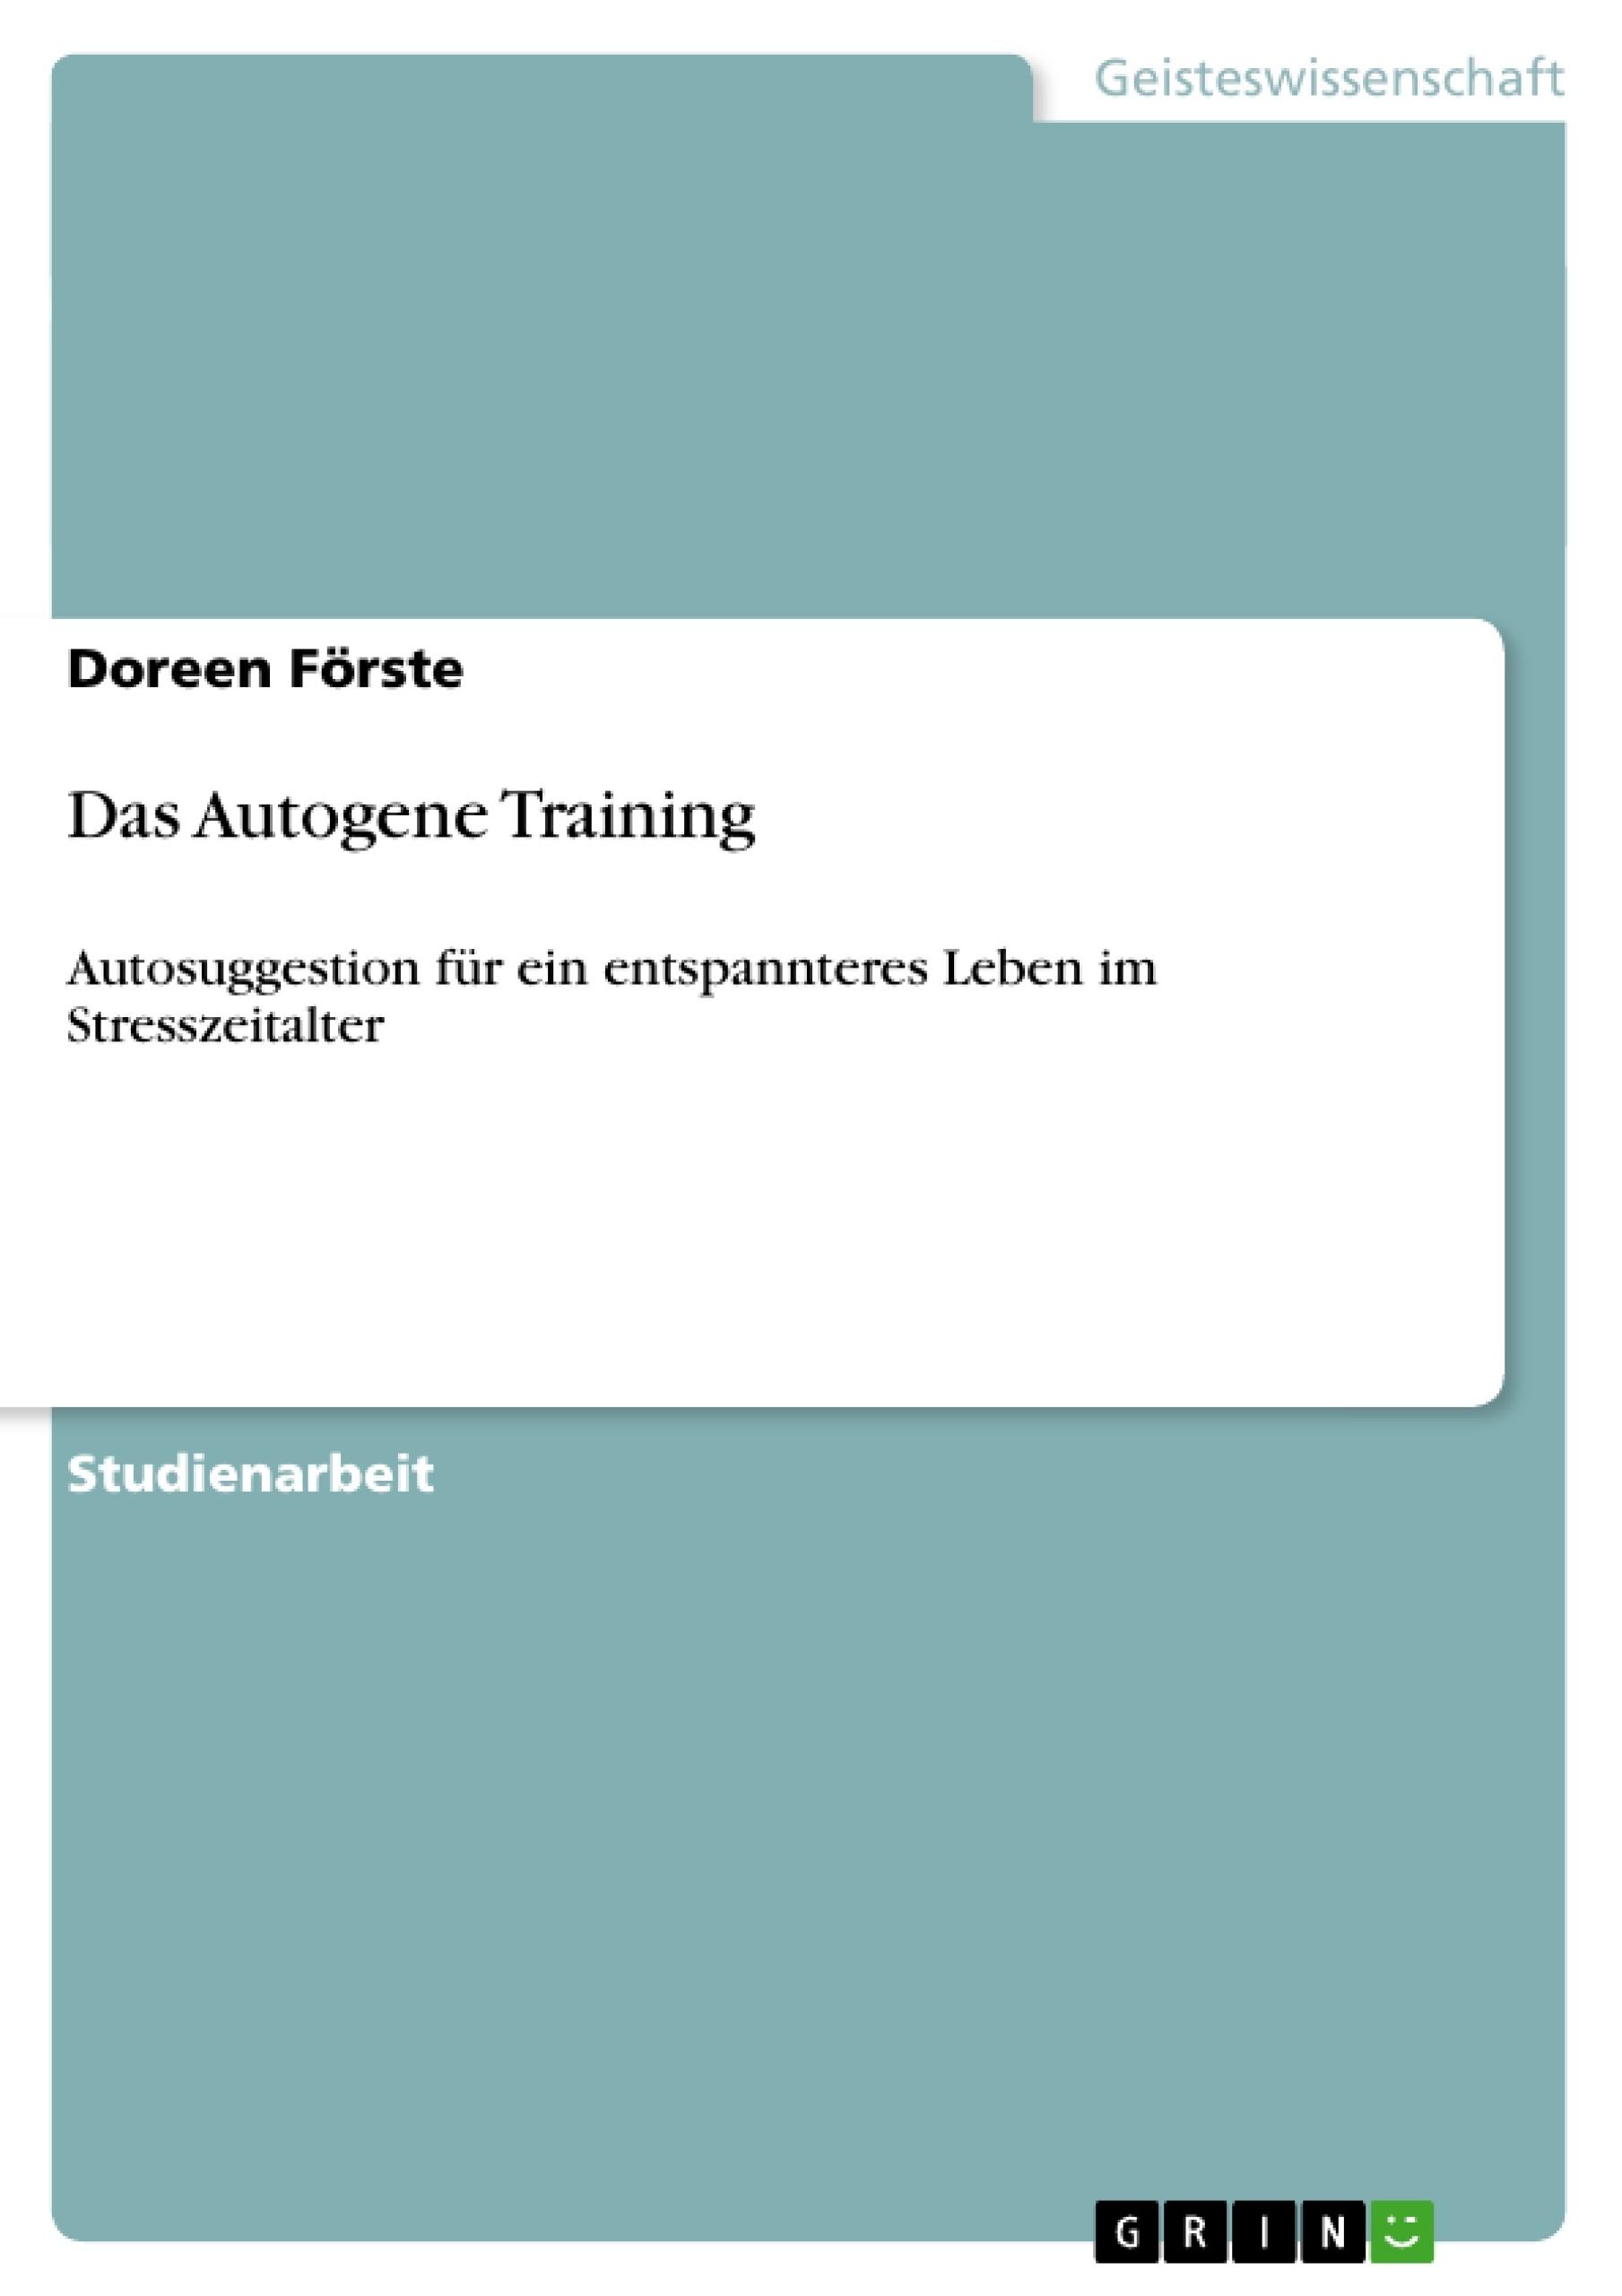 Titel: Das Autogene Training